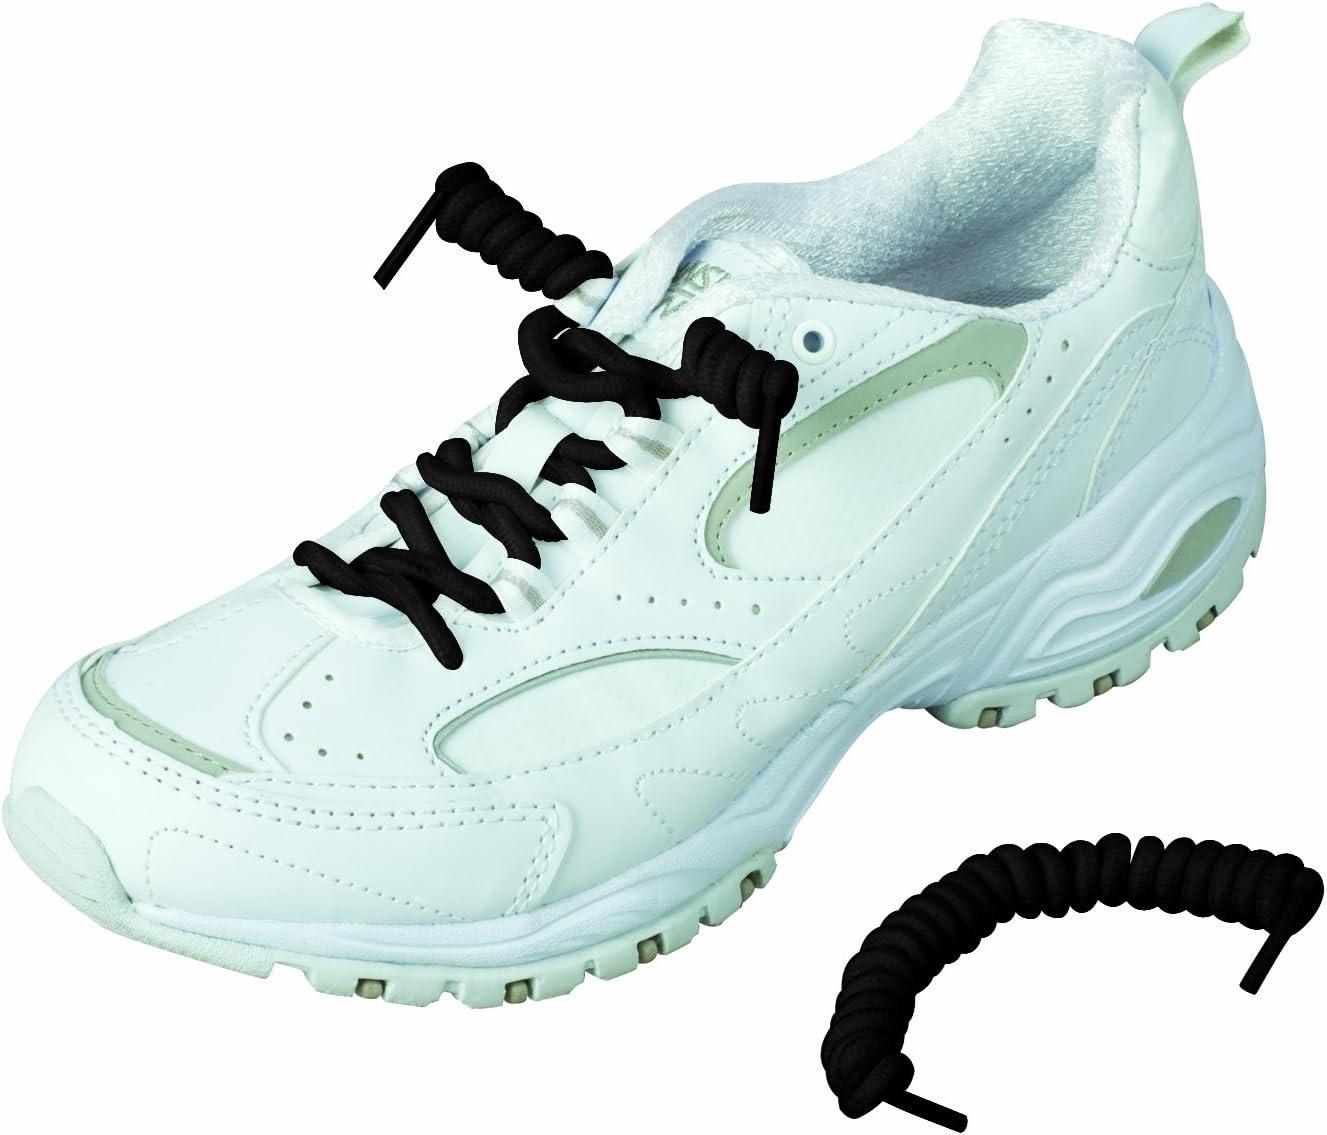 HealthSmart Coiler Elastic Shoe Laces